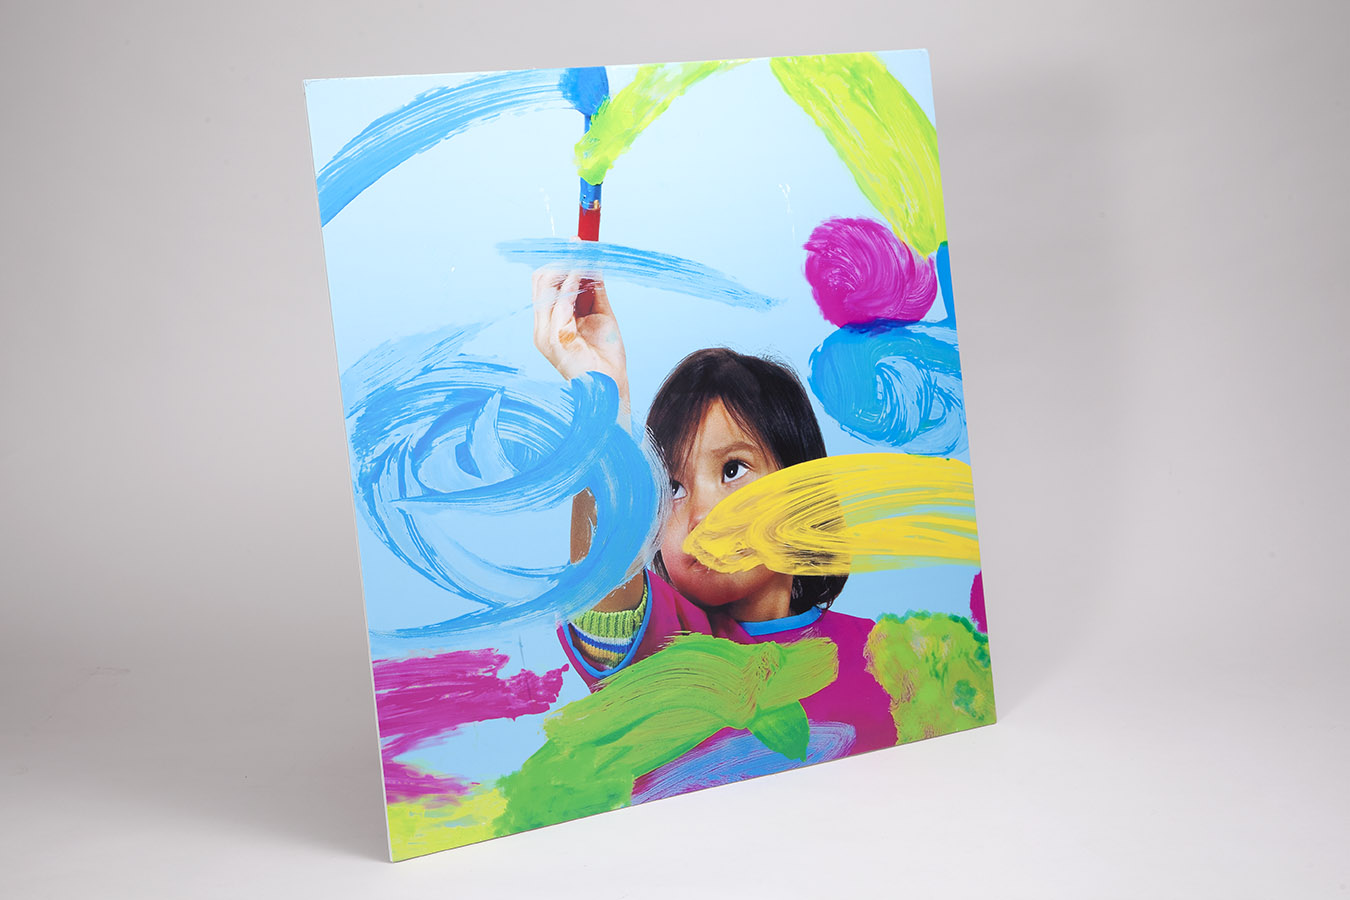 Gatorboard mounted photo panel